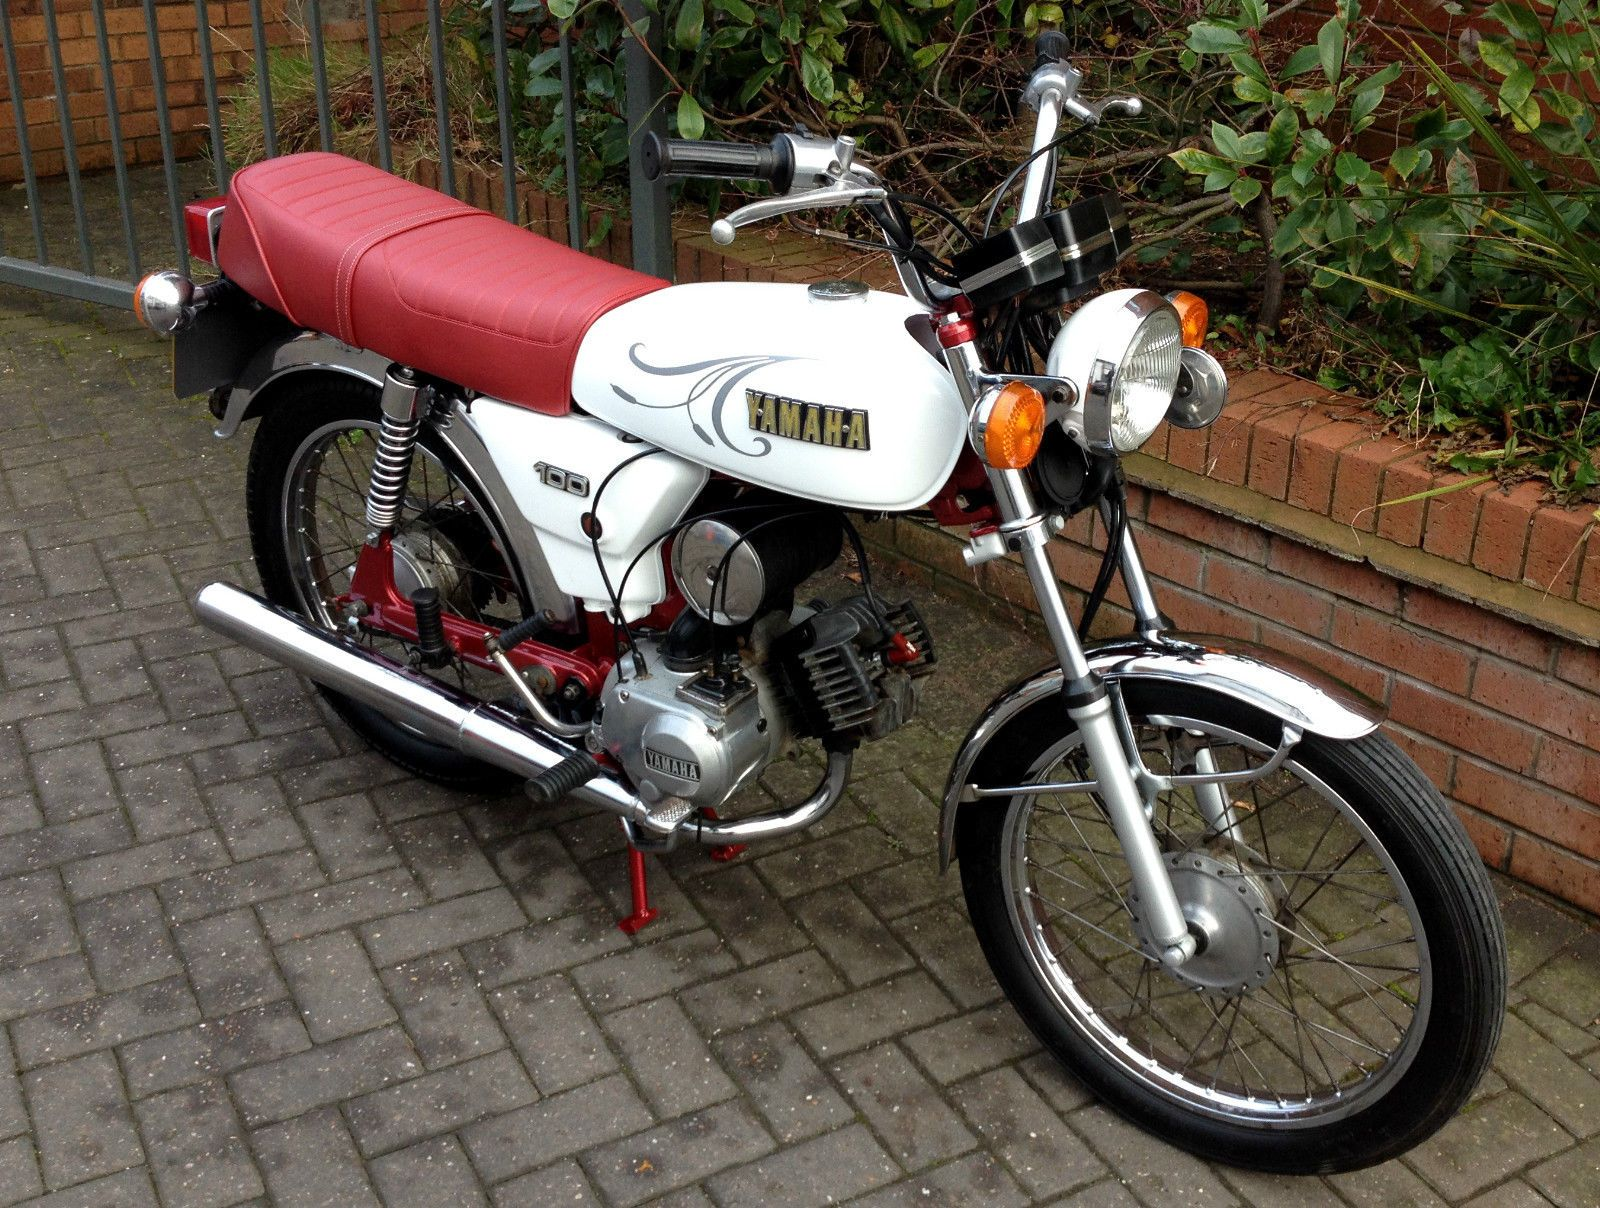 1985 Yamaha Yb100 995 Yamaha Motorcycles Yamaha Motorcycle